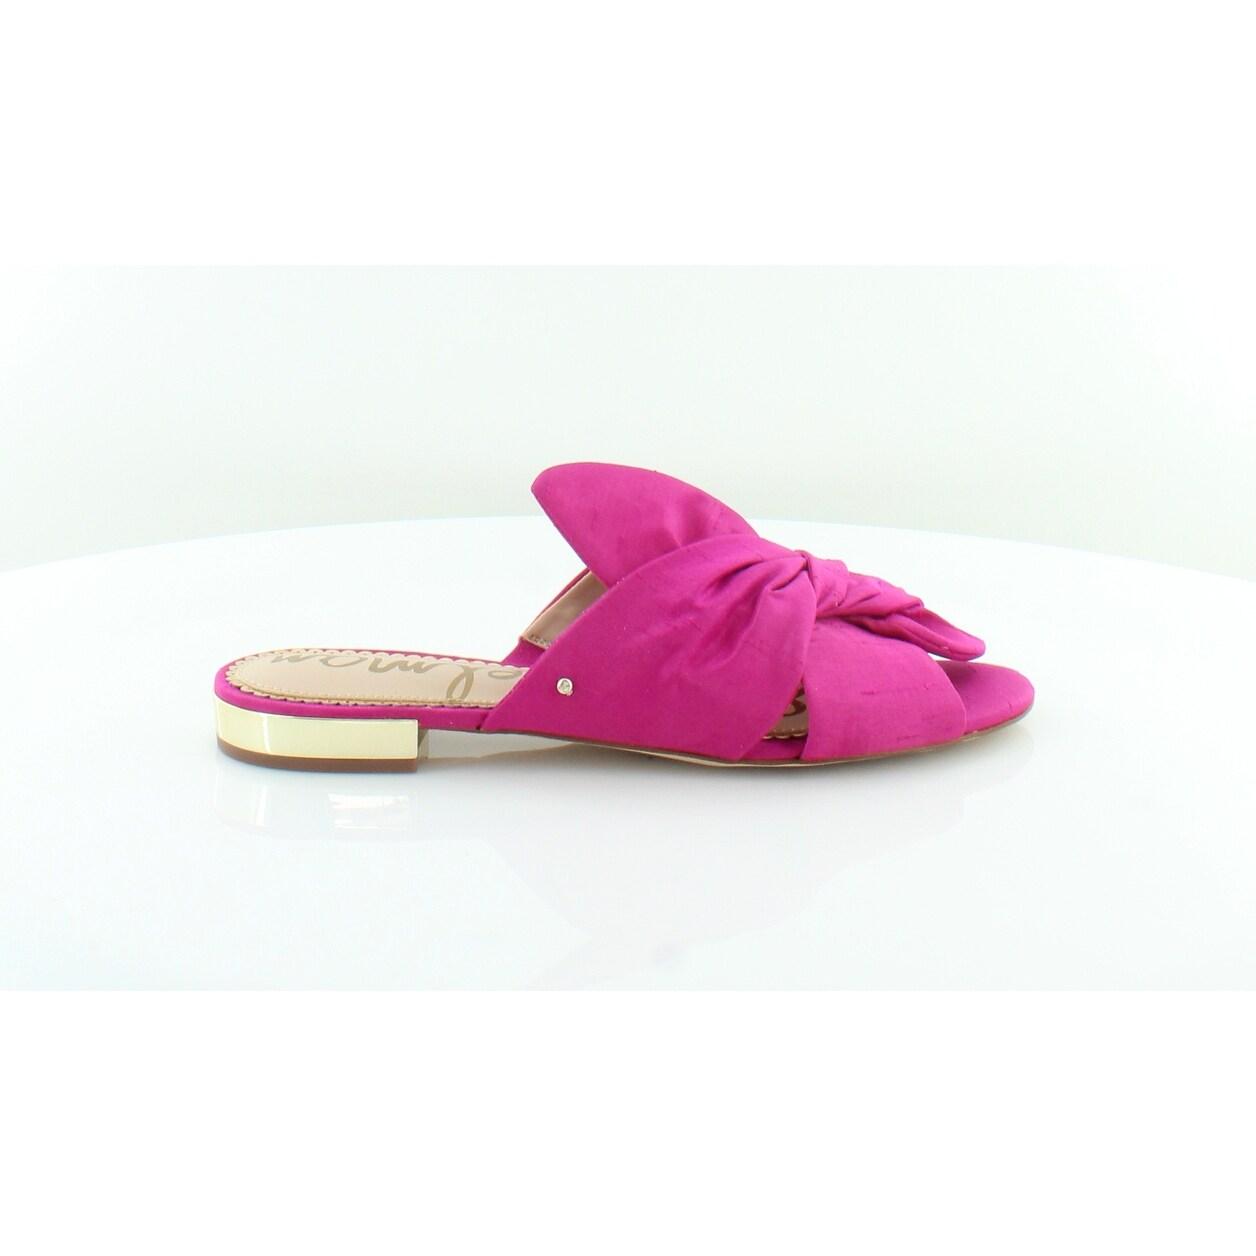 07f84e73c9f2 Shop Sam Edelman Darian Women s Sandals Deep Pink - Free Shipping Today -  Overstock - 26510273